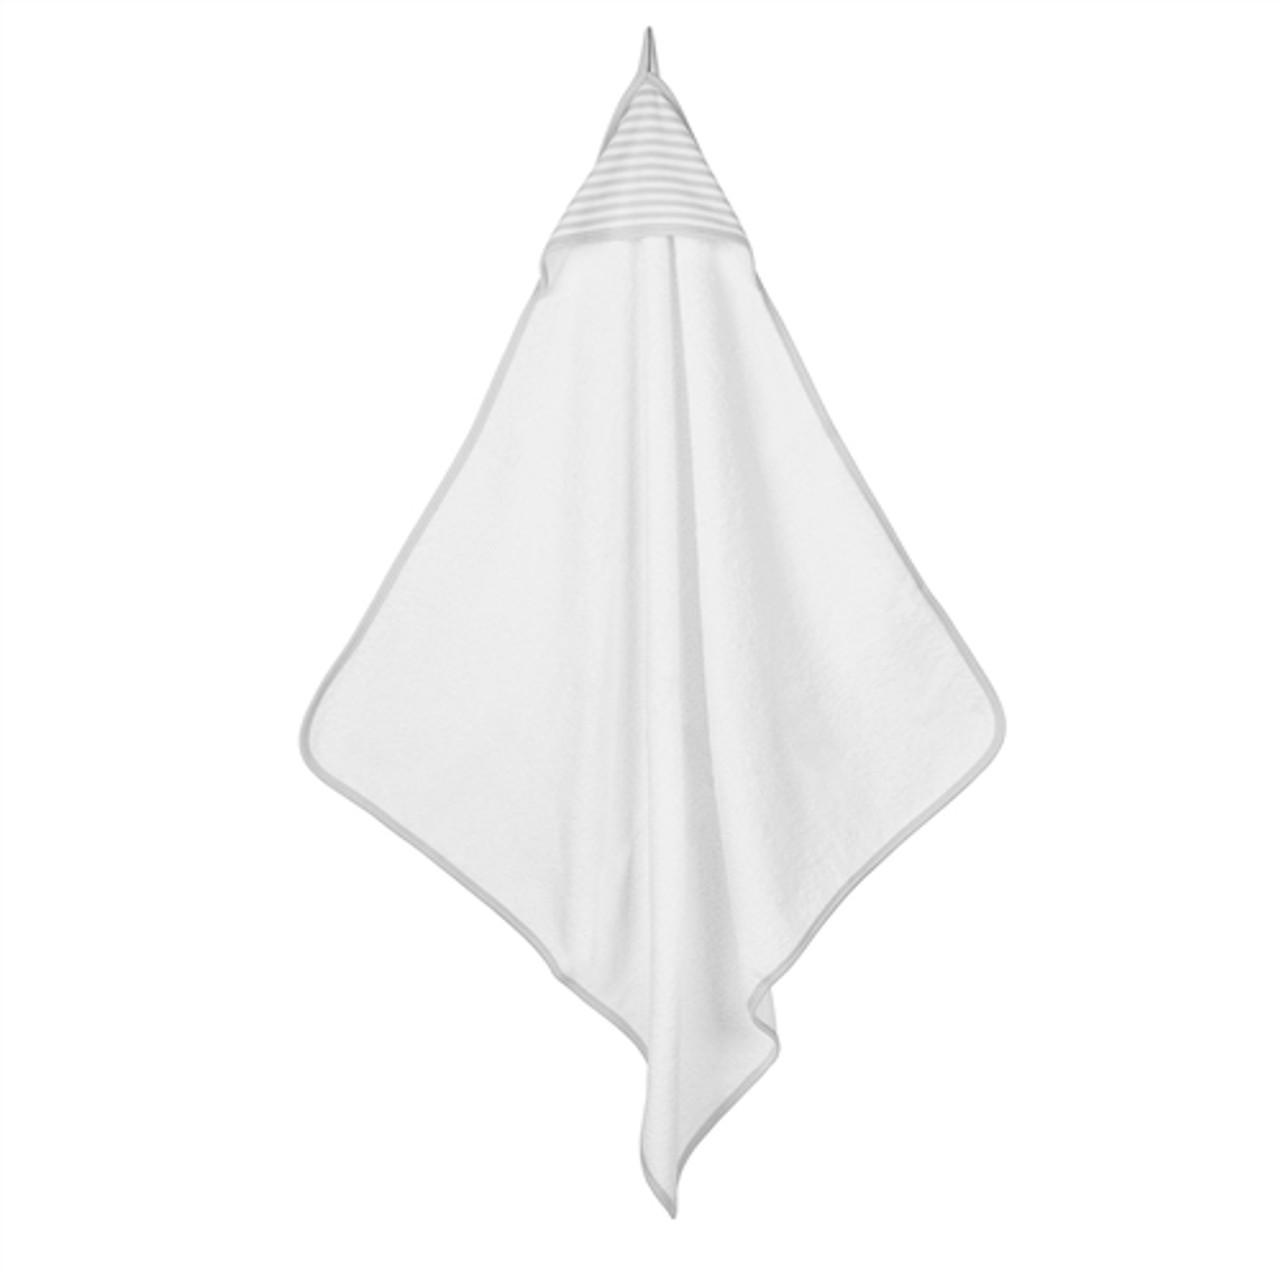 Hooded Organic Baby Towel - Gray